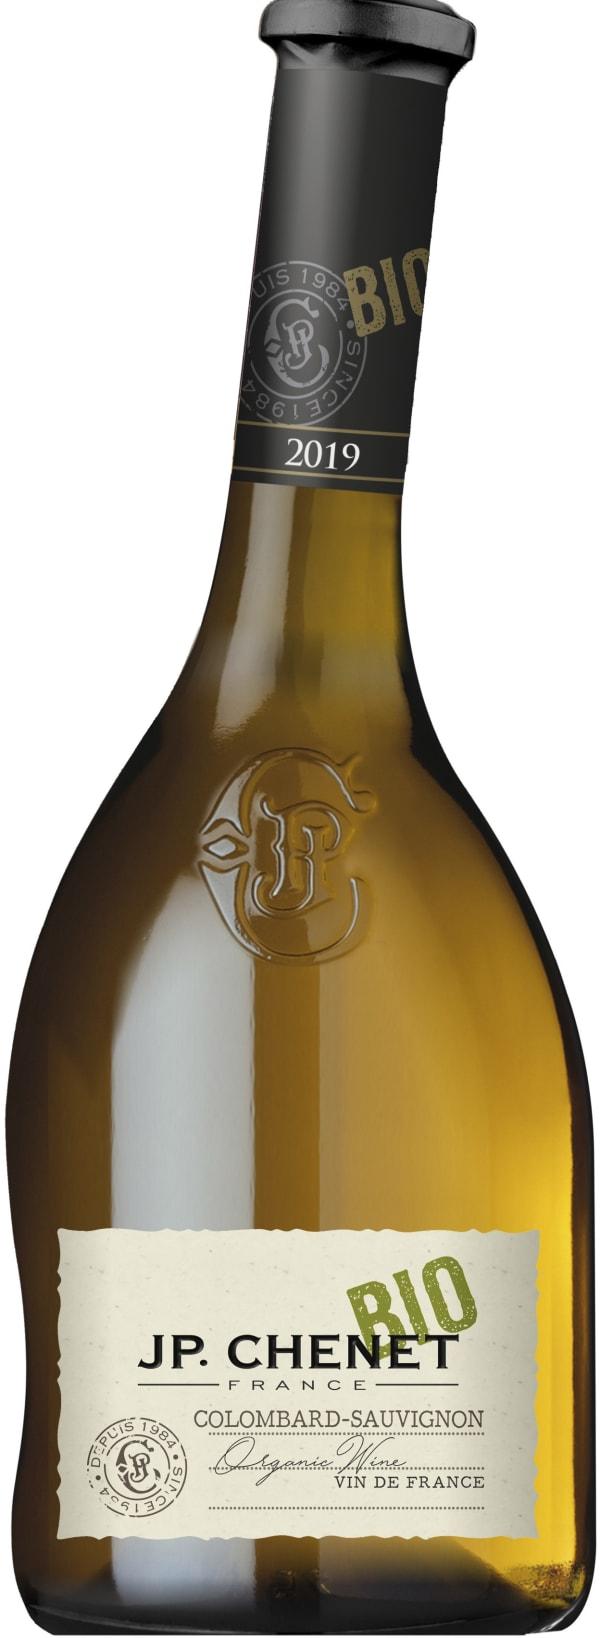 JP. Chenet Colombard-Chardonnay Organic 2017